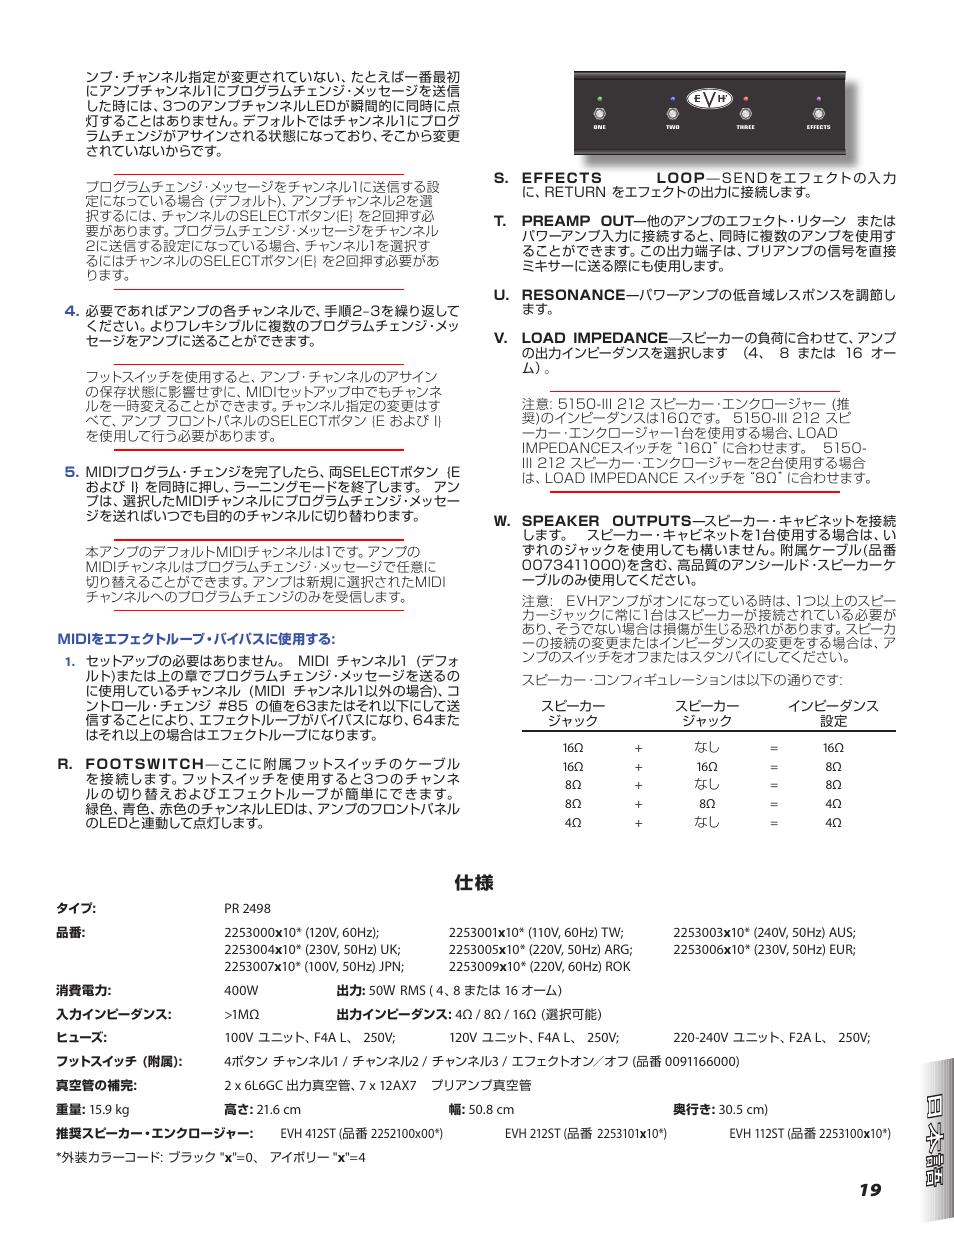 Evh 5150iii 50 Watt Amp Head User Manual Page 19 20 Original Mode Amplifier